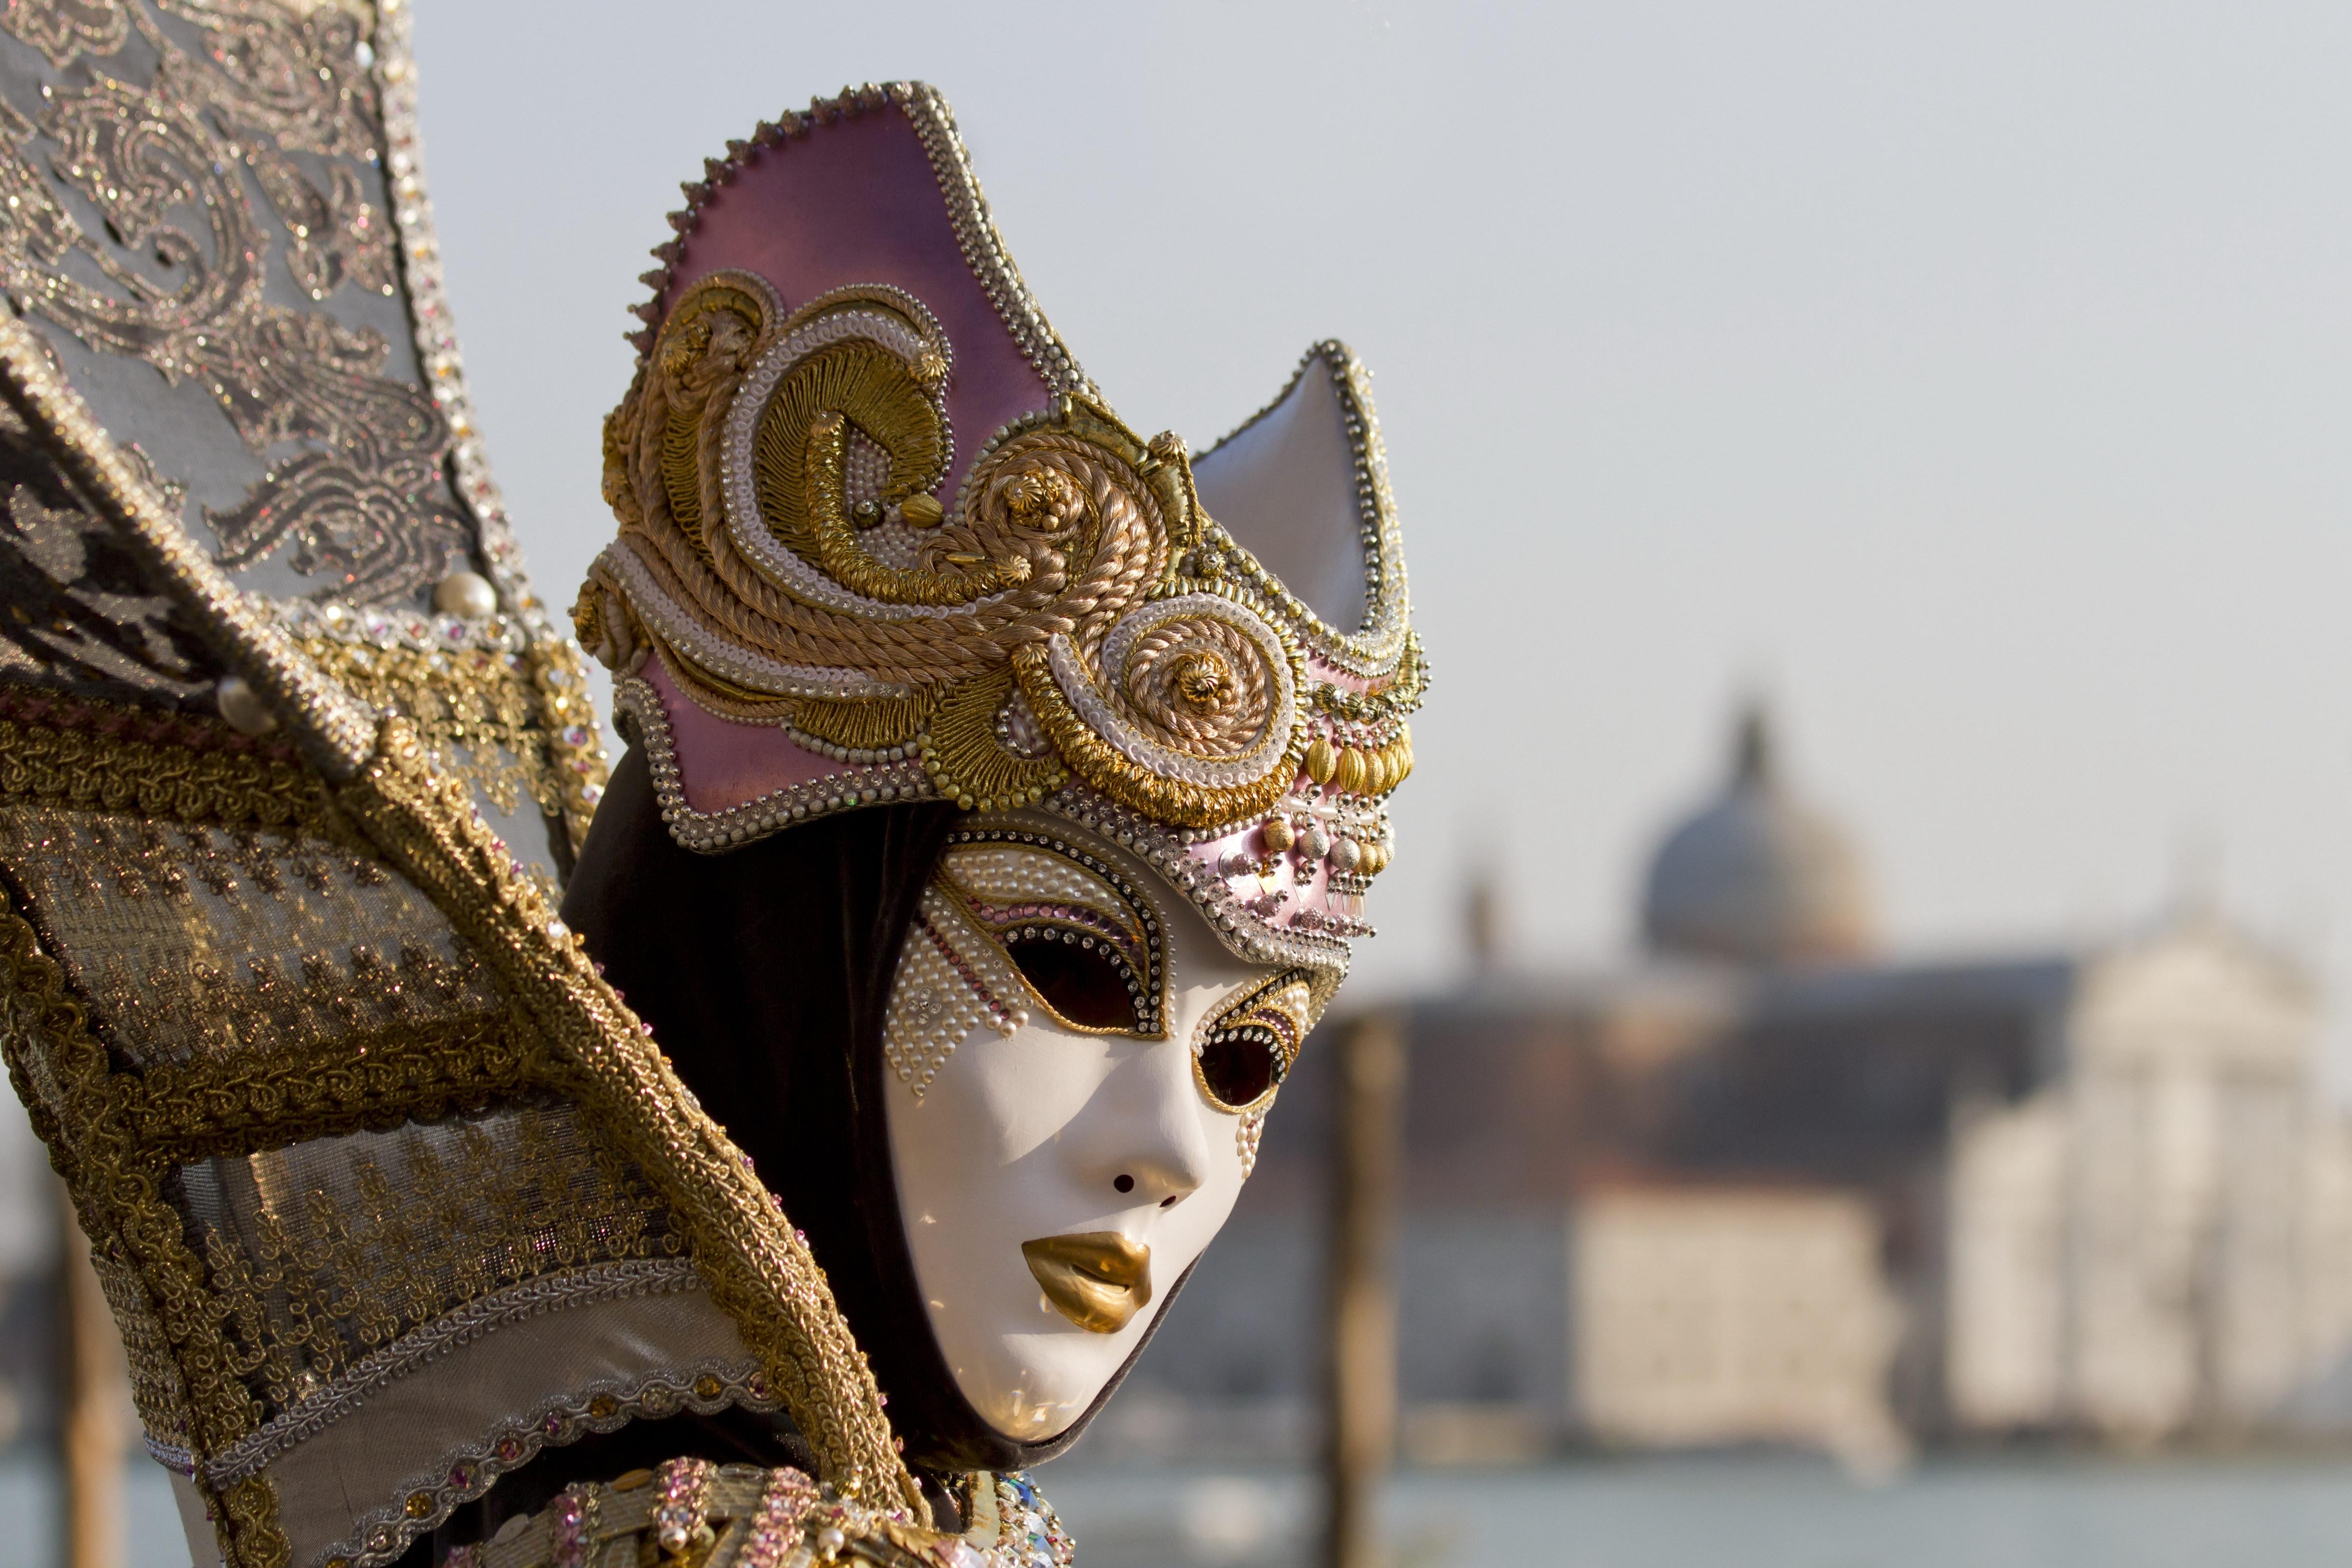 картинки венецианского маскарада